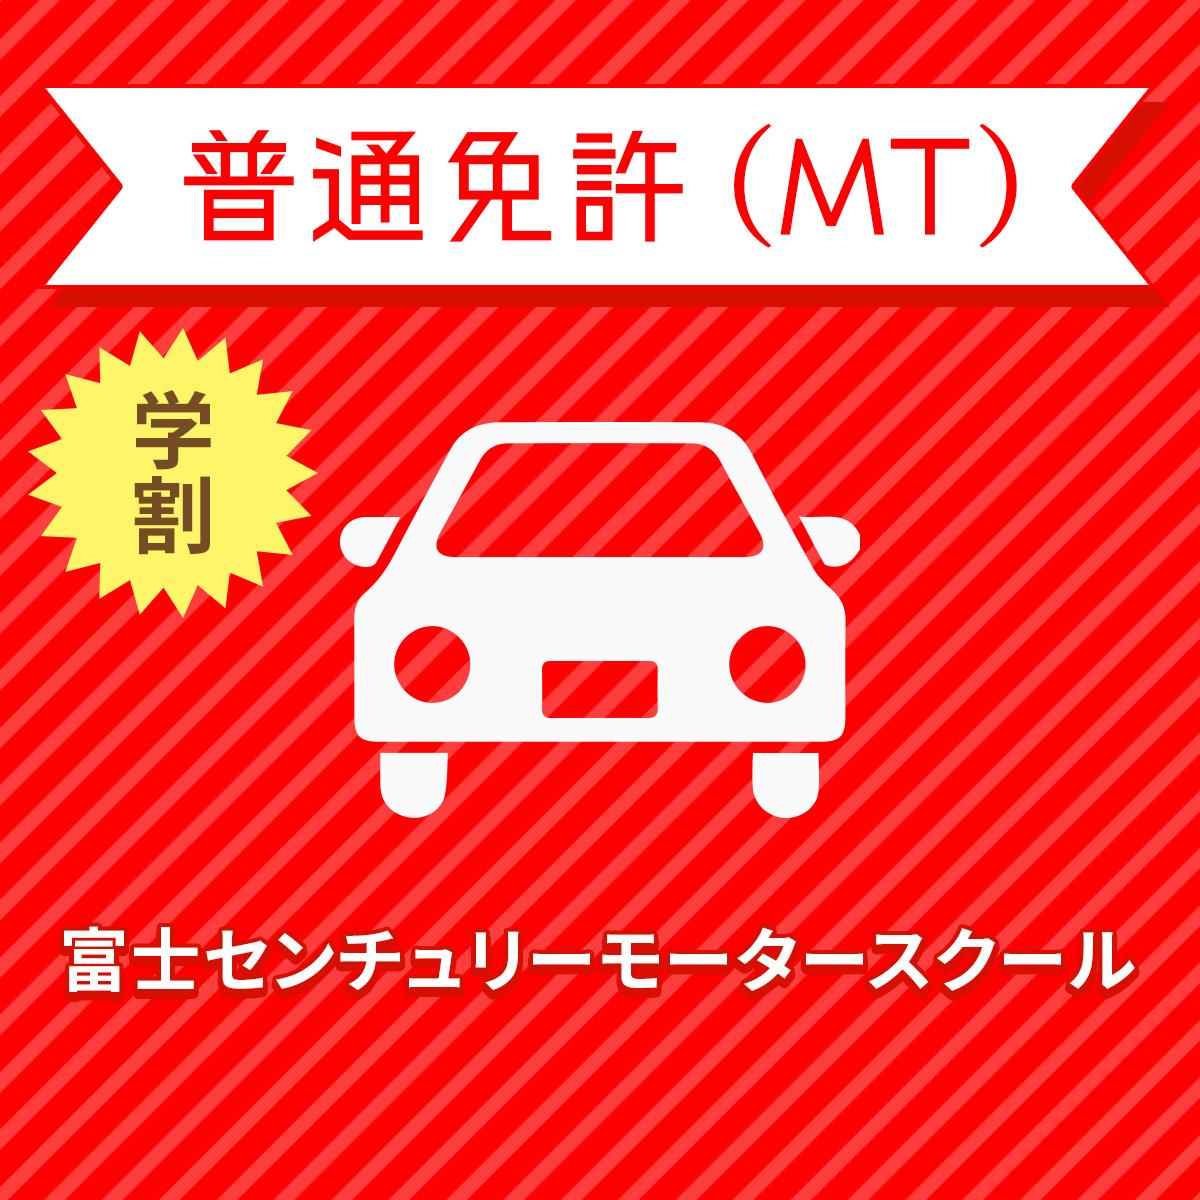 【静岡県裾野市】普通車MTコース(高校生料金)<免許なし/原付免許所持対象>